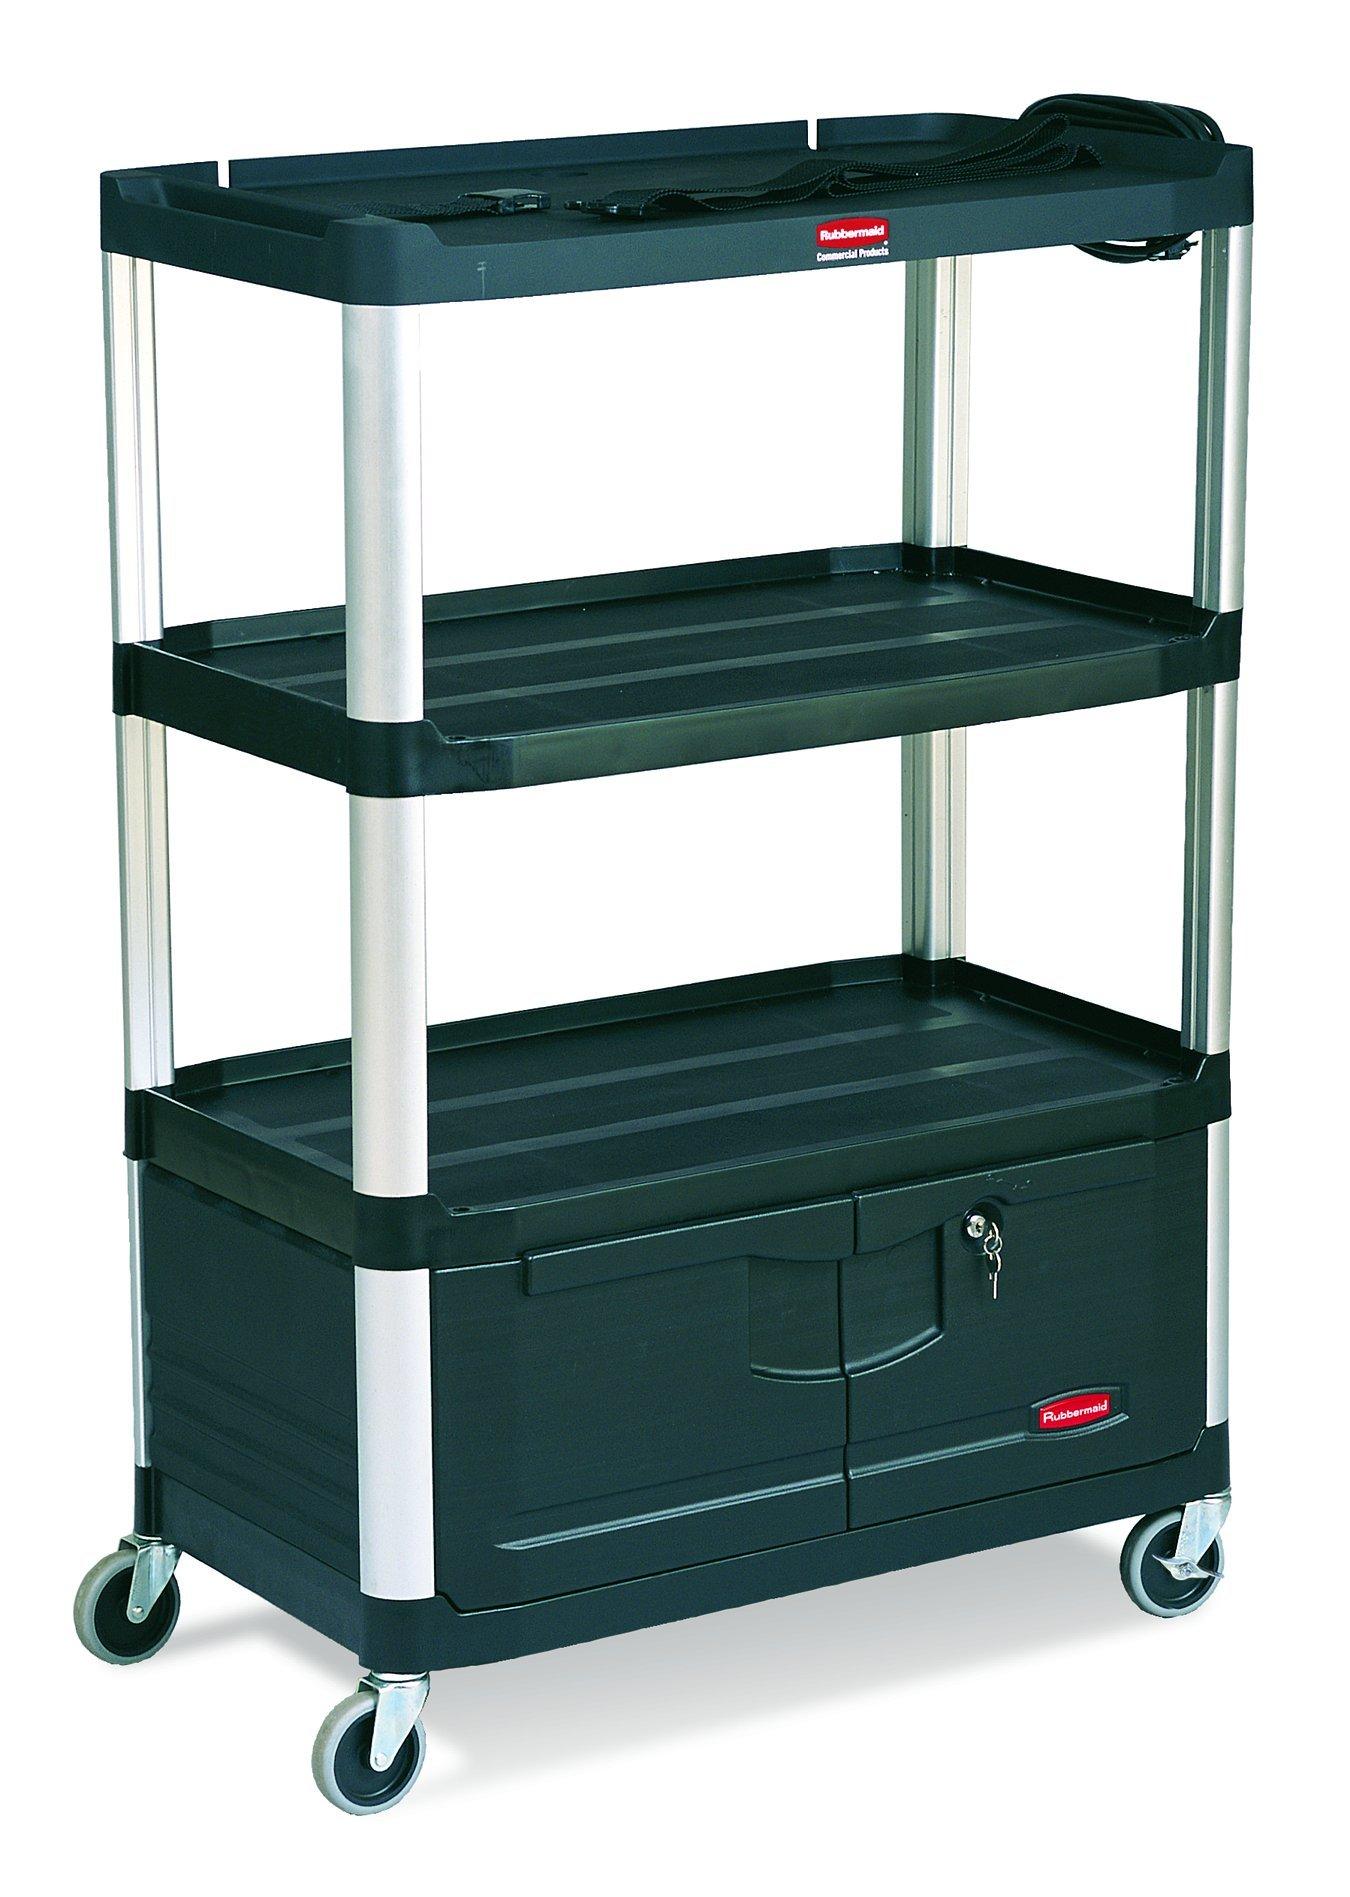 Rubbermaid Commercial FG9T3500BLA Audio-Visual Aluminum Service Cart, 4 Shelves With Cabinet, 4-inch Diameter Casters, Black